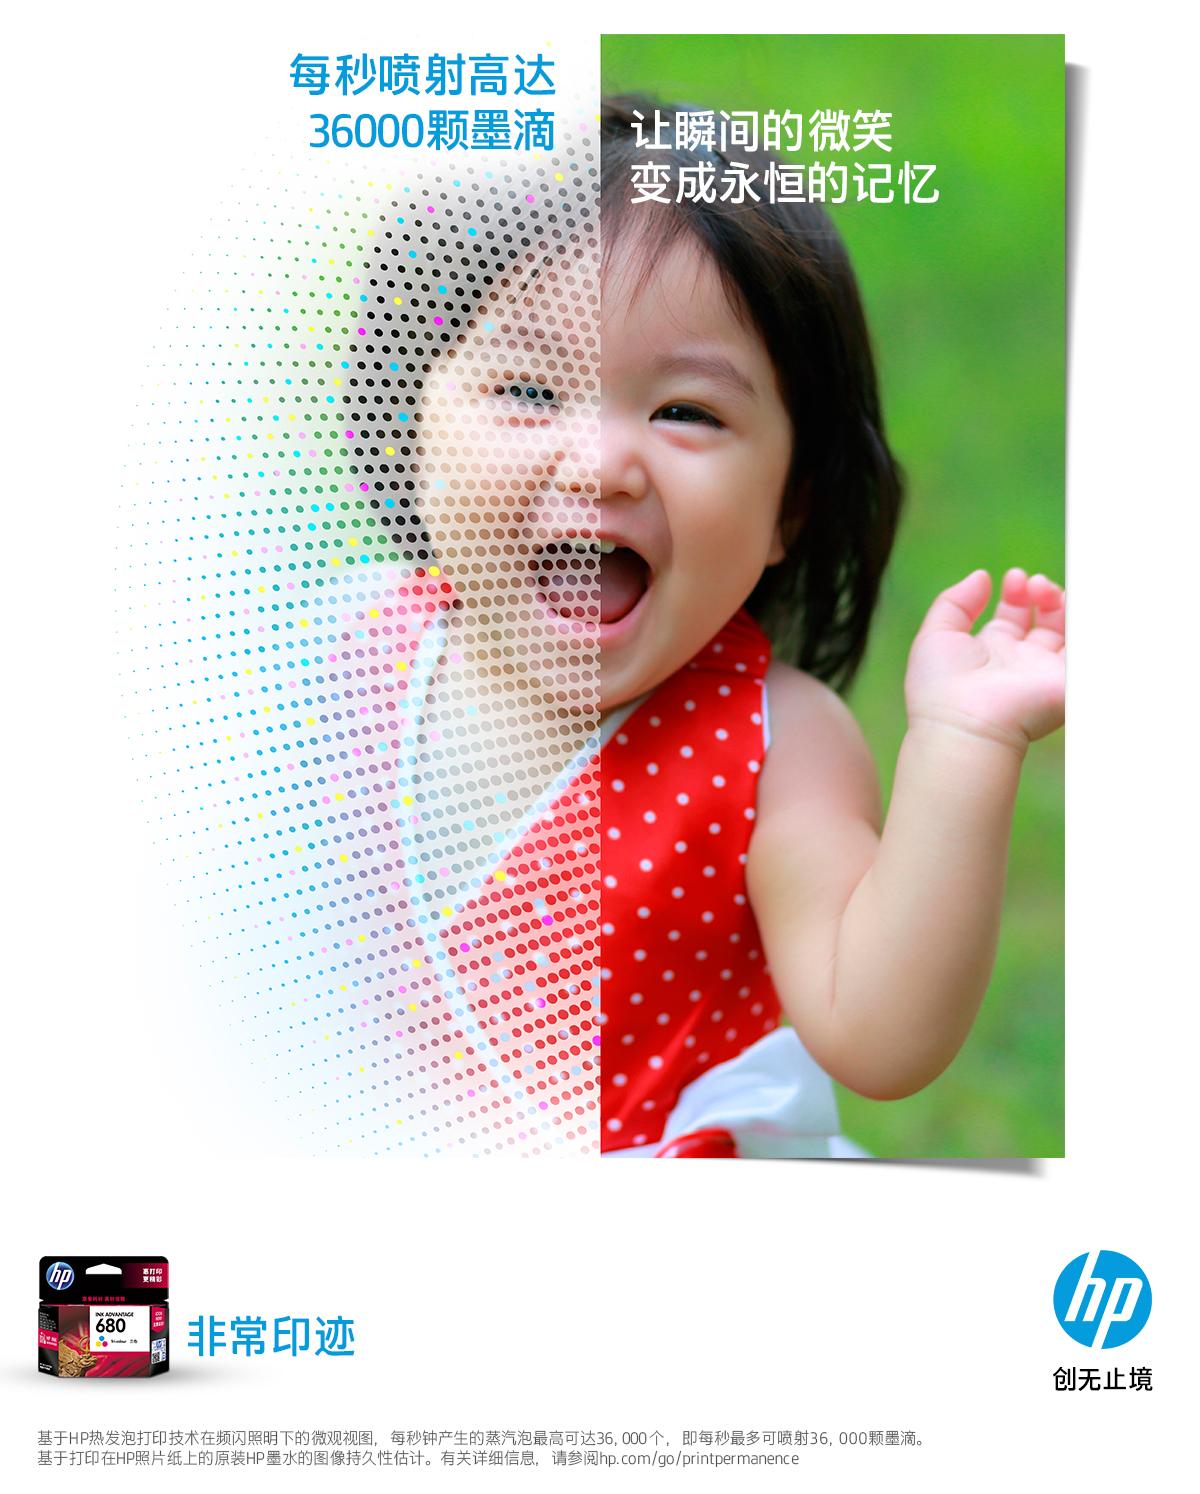 HP_statics_FINALS_bub6-4_CN.JPG